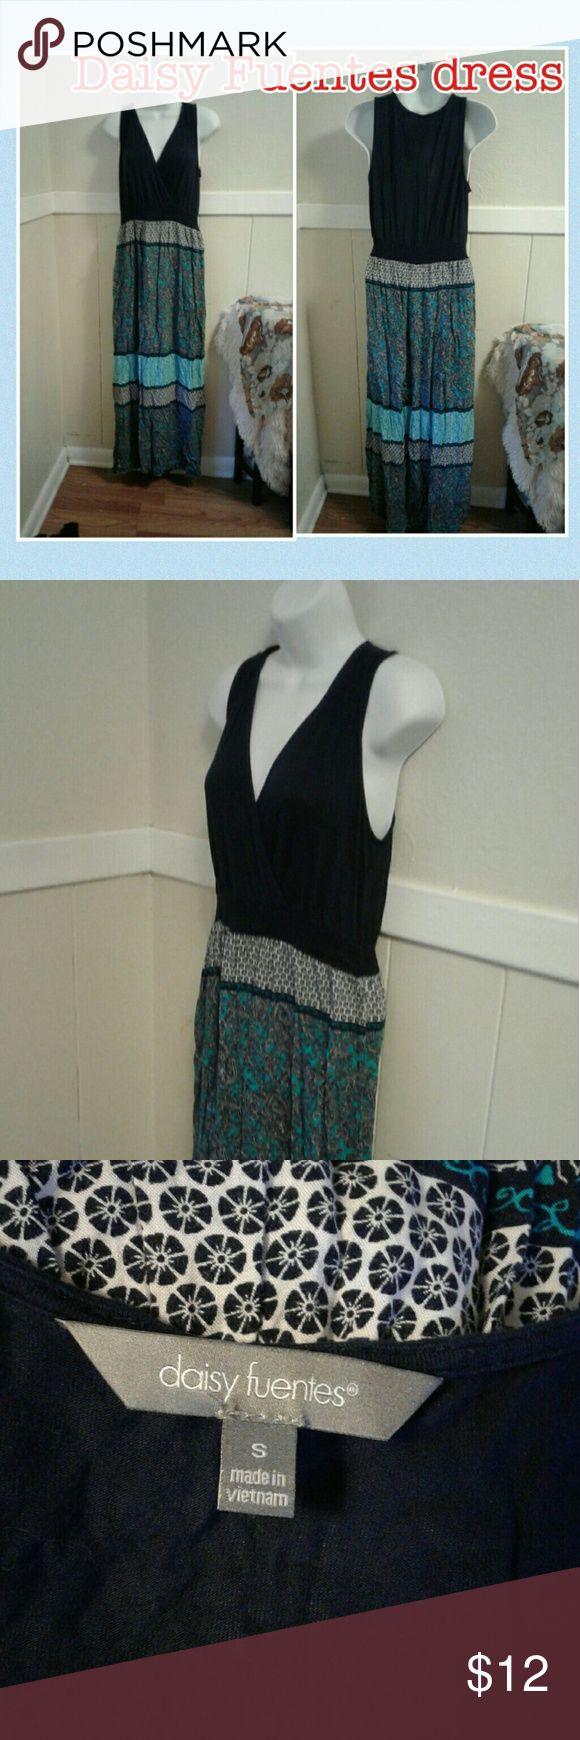 Daisy Fuentes maxi dress Daisy Fuentes maxi dress looks new Daisy Fuentes Dresses Maxi